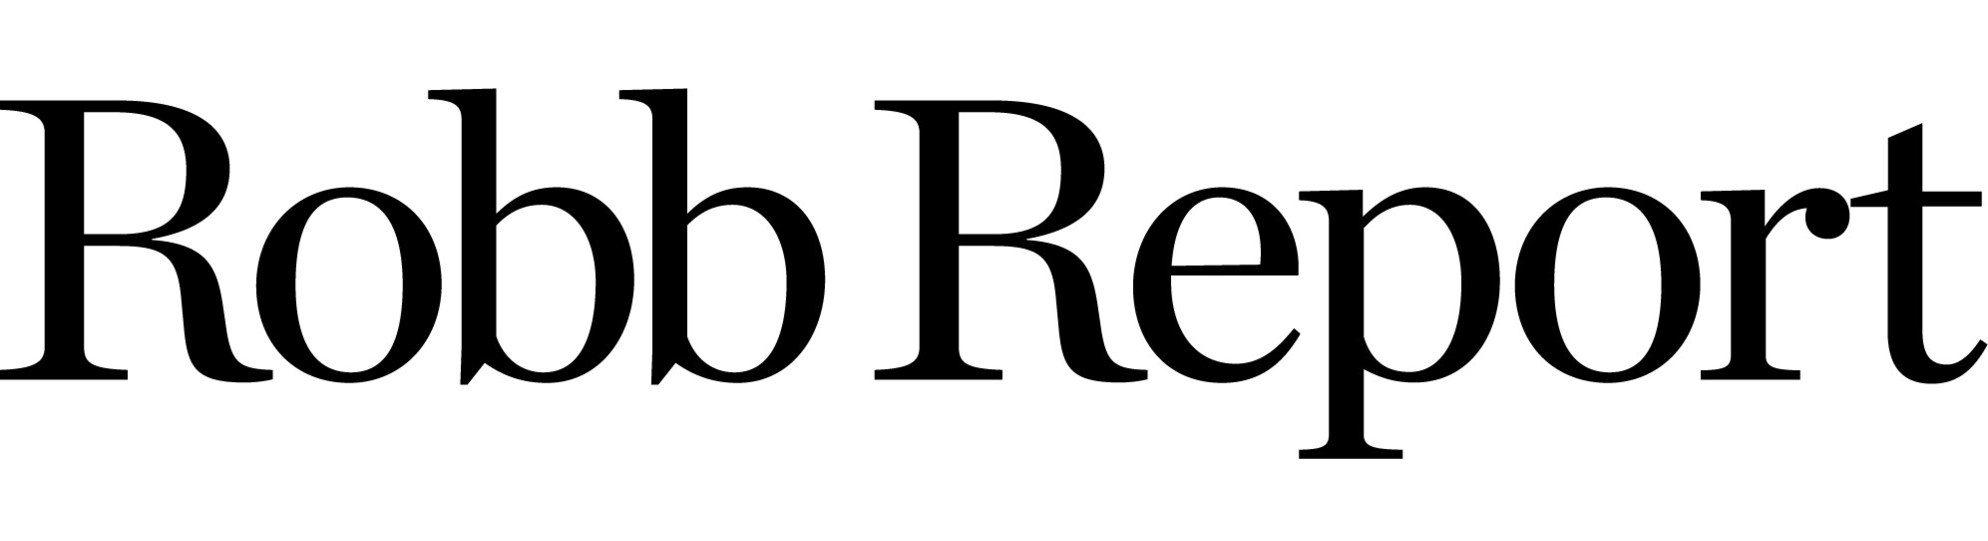 Robb-Report-logo.jpg